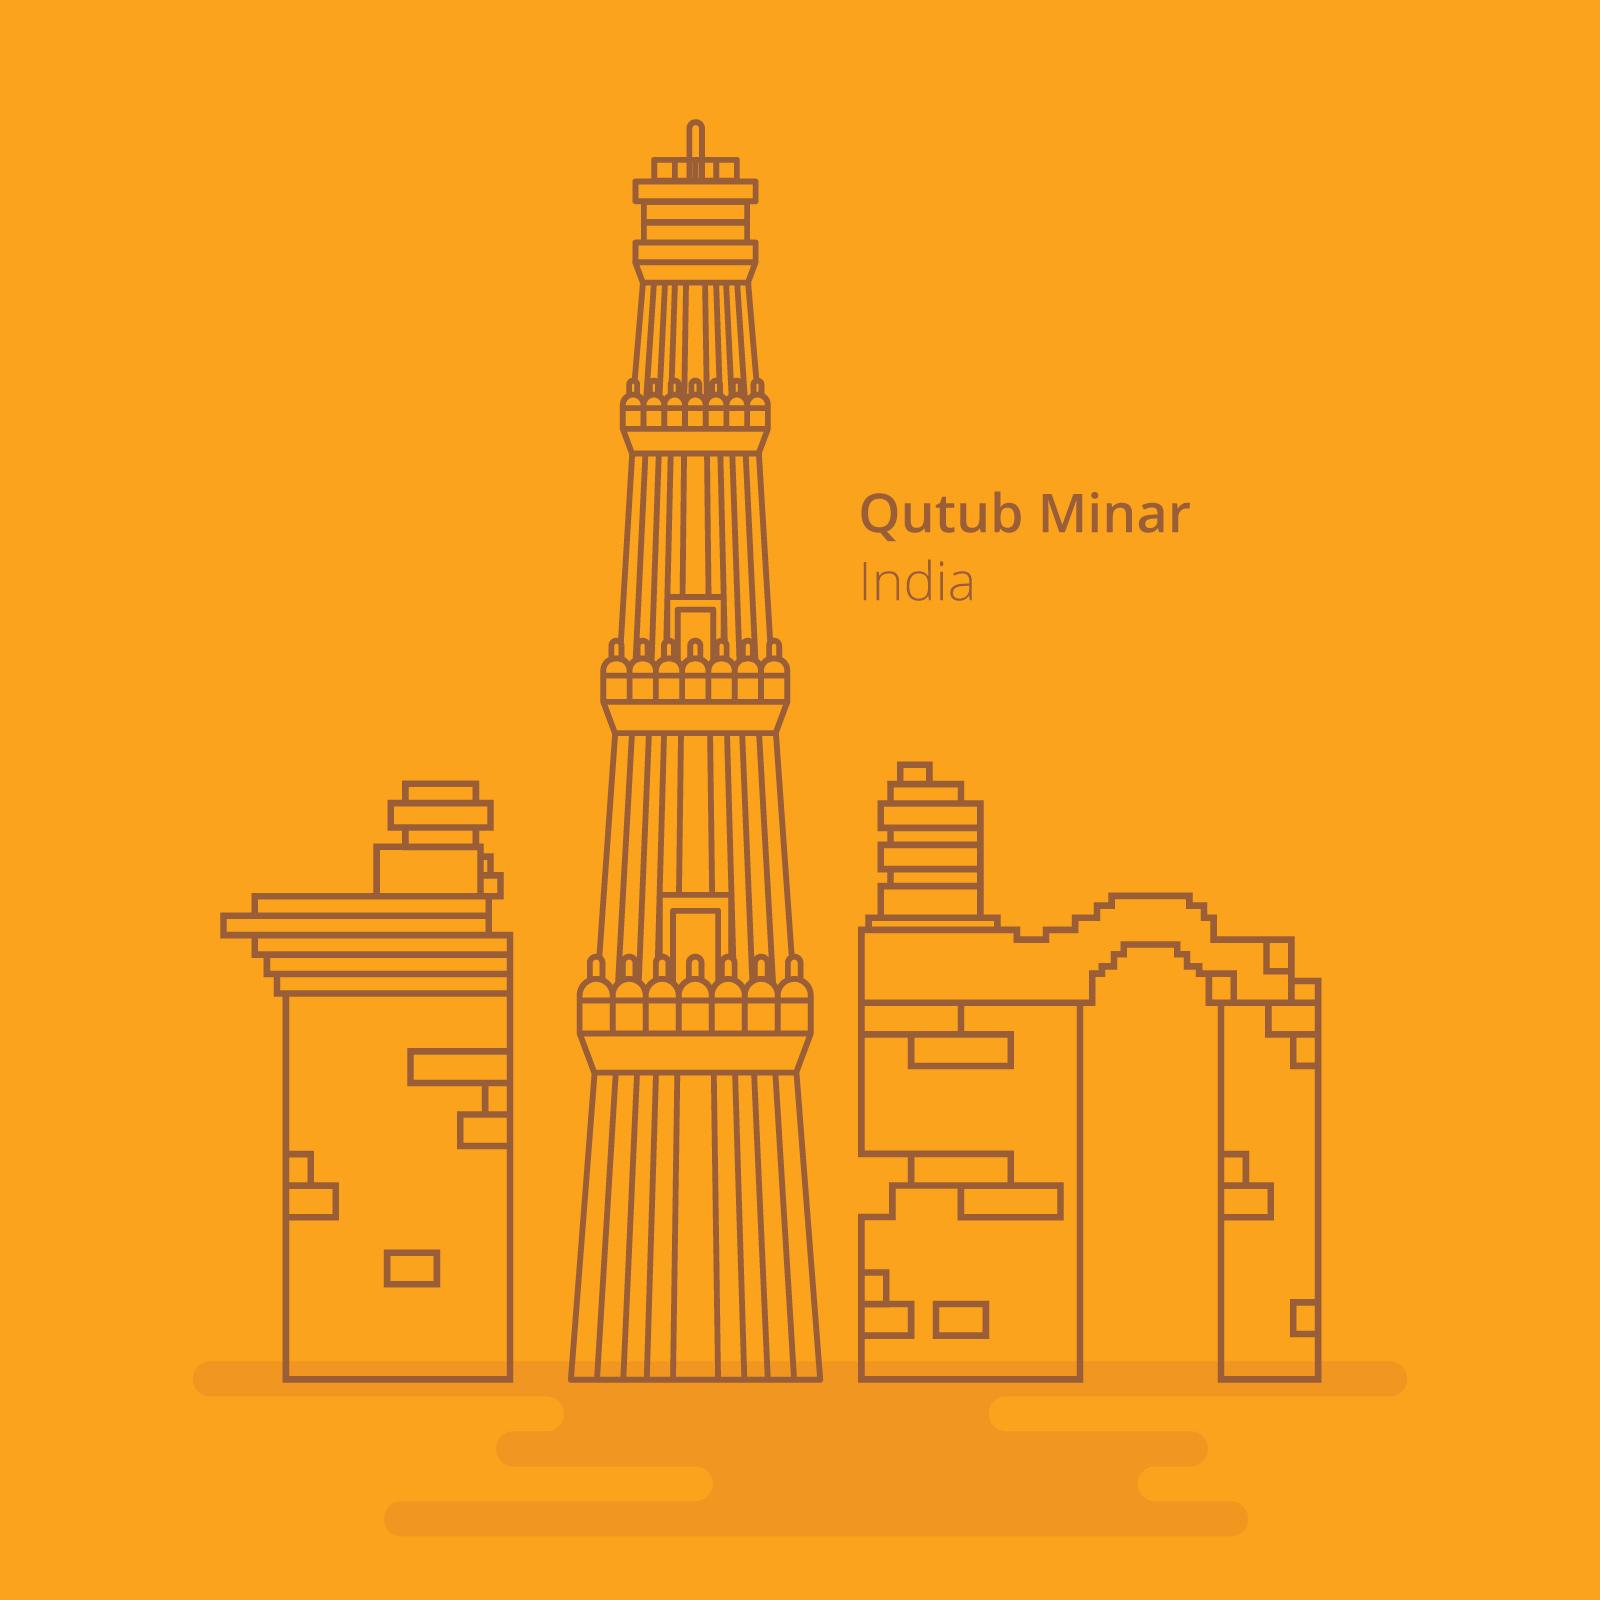 Line Drawing Of Qutub Minar : Qutub minar india landmark line style download free